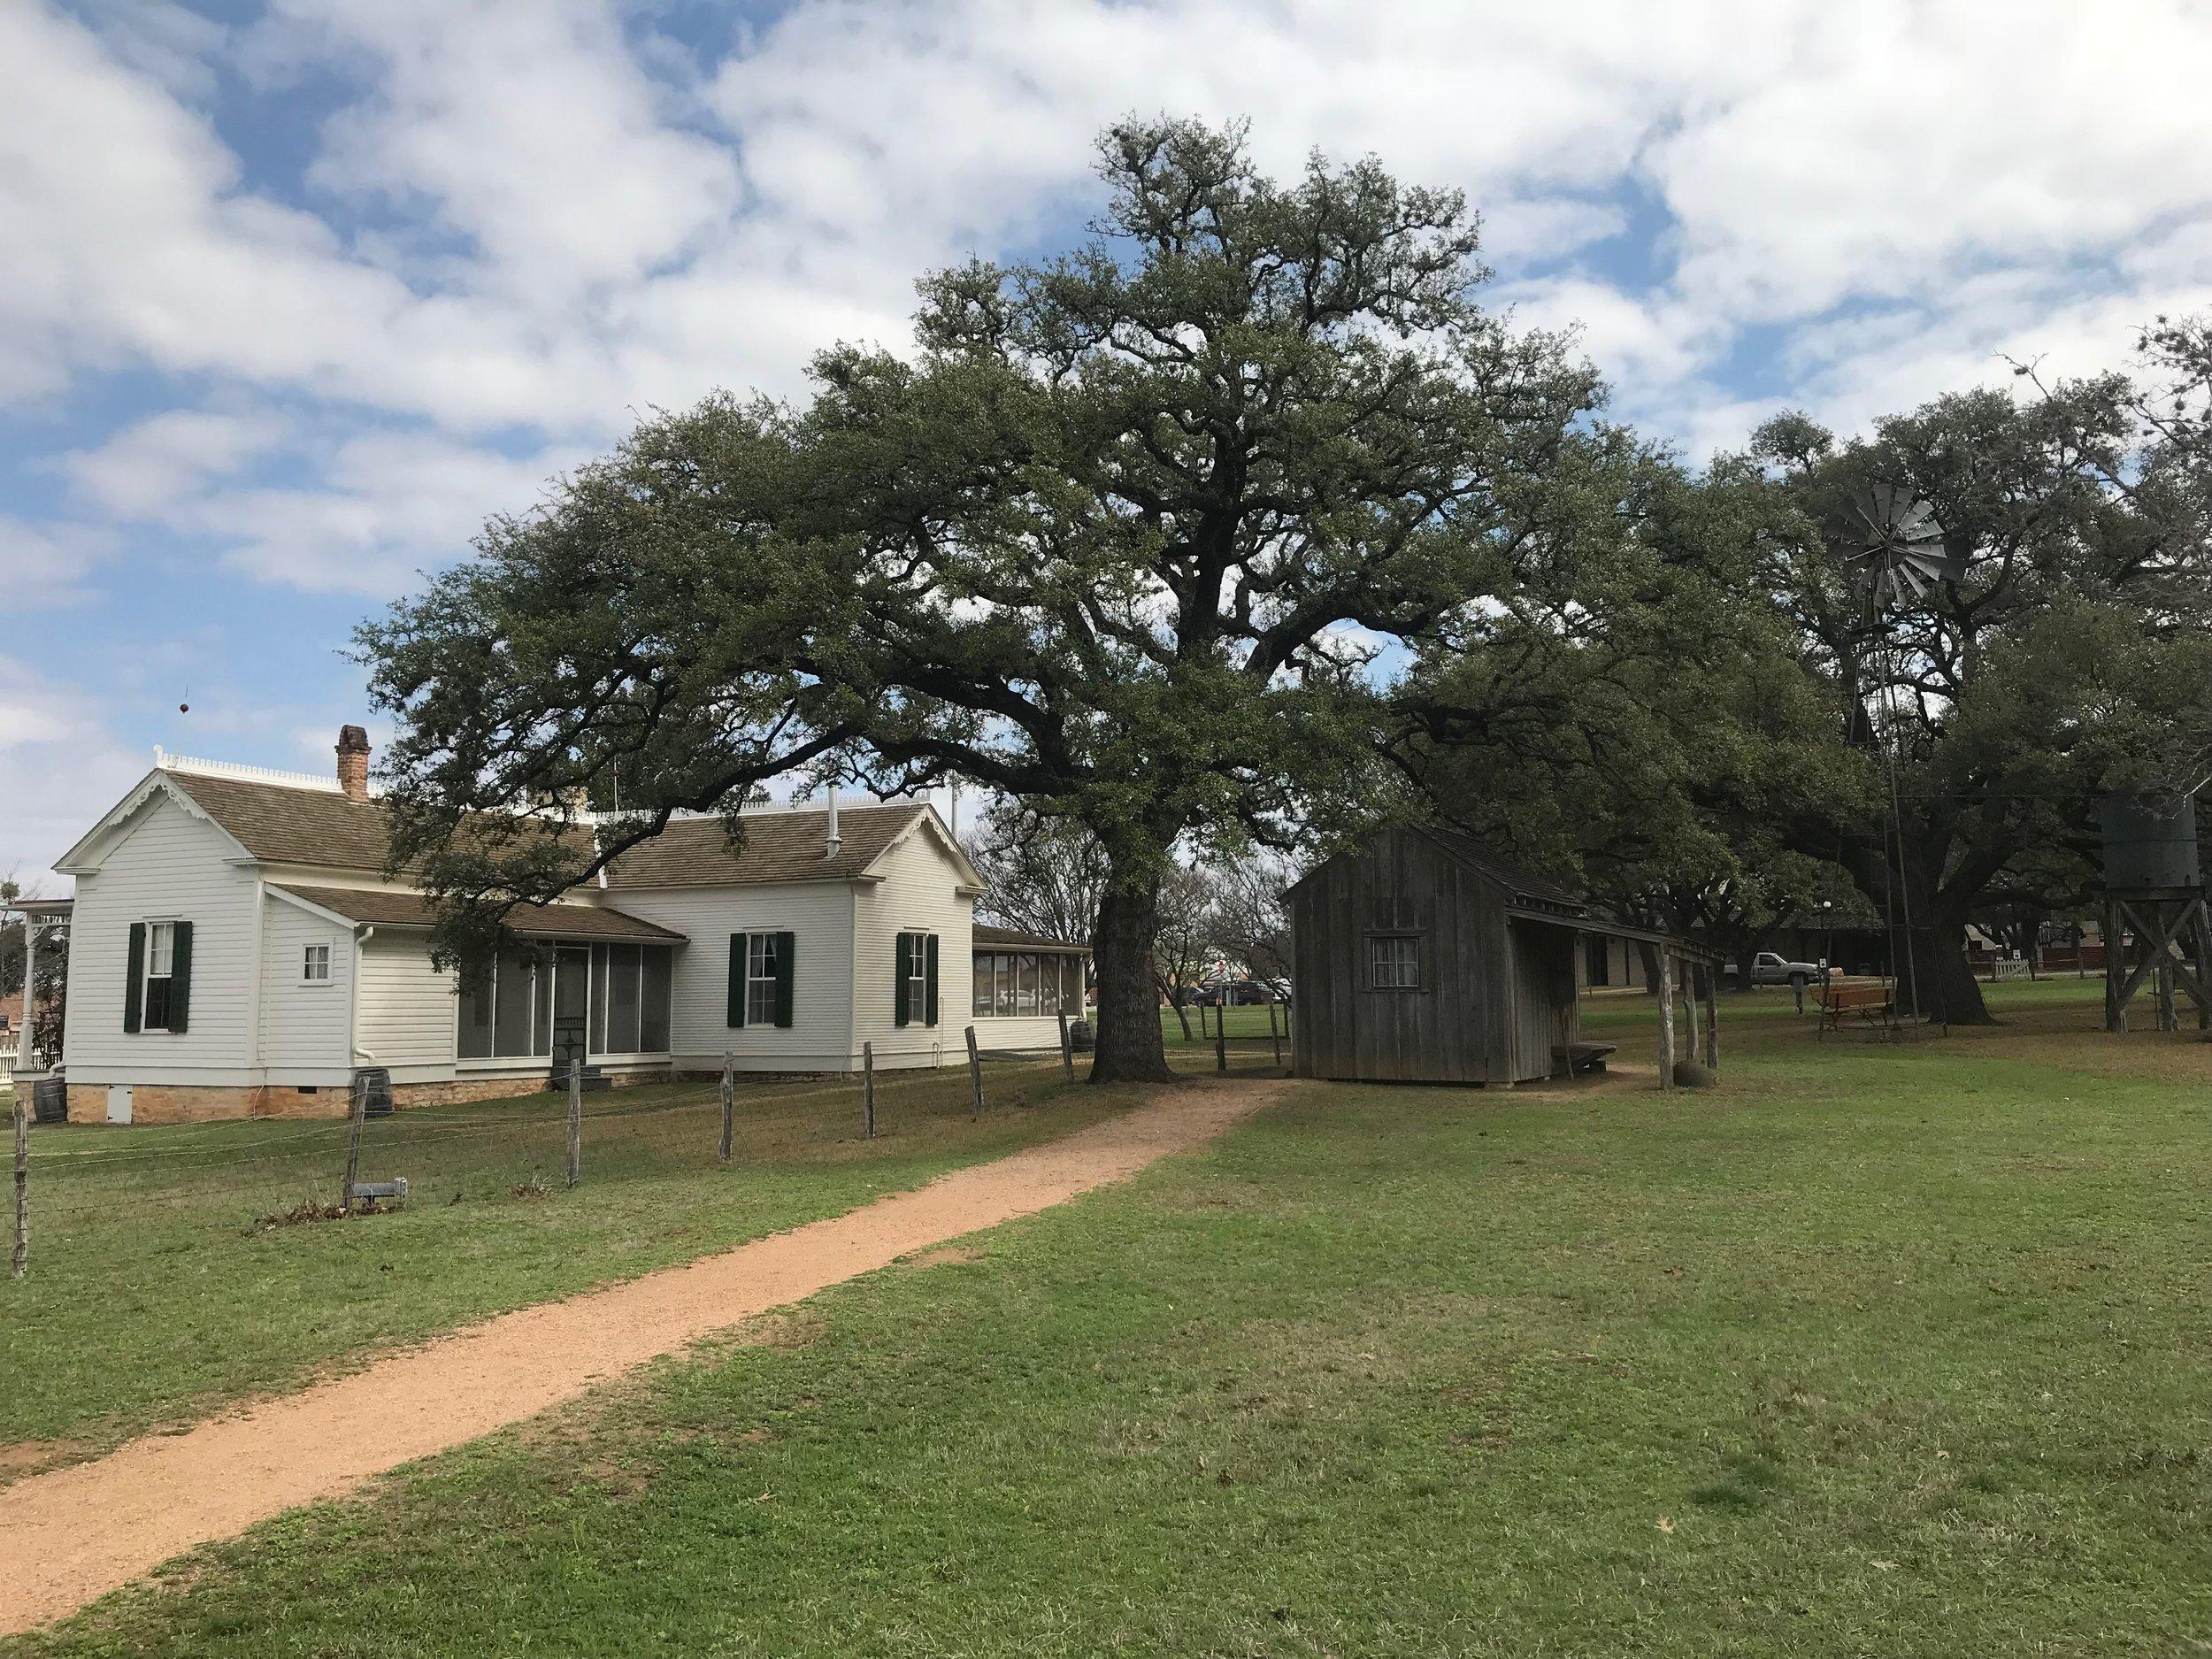 Lyndon Johnson's boyhood home in Johnson City, Texas. Photo by Rick Holmes